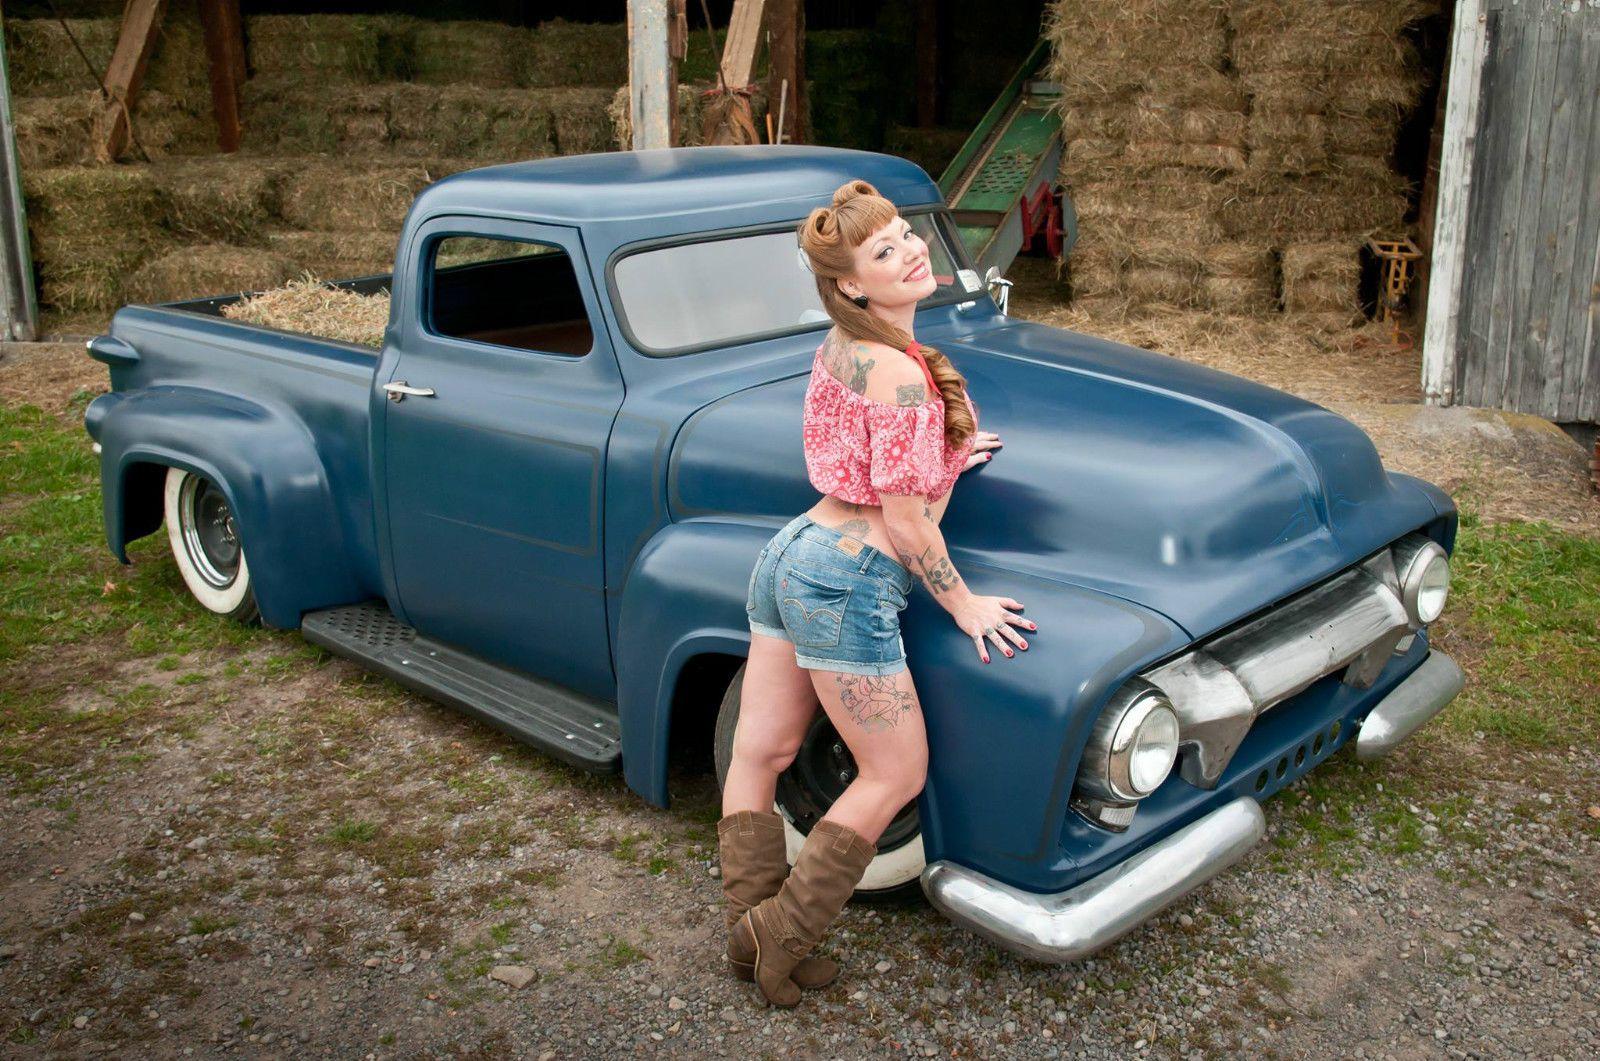 1954 Ford F100 Chopped Top Lead Sled Rat Rod | Ford trucks ...